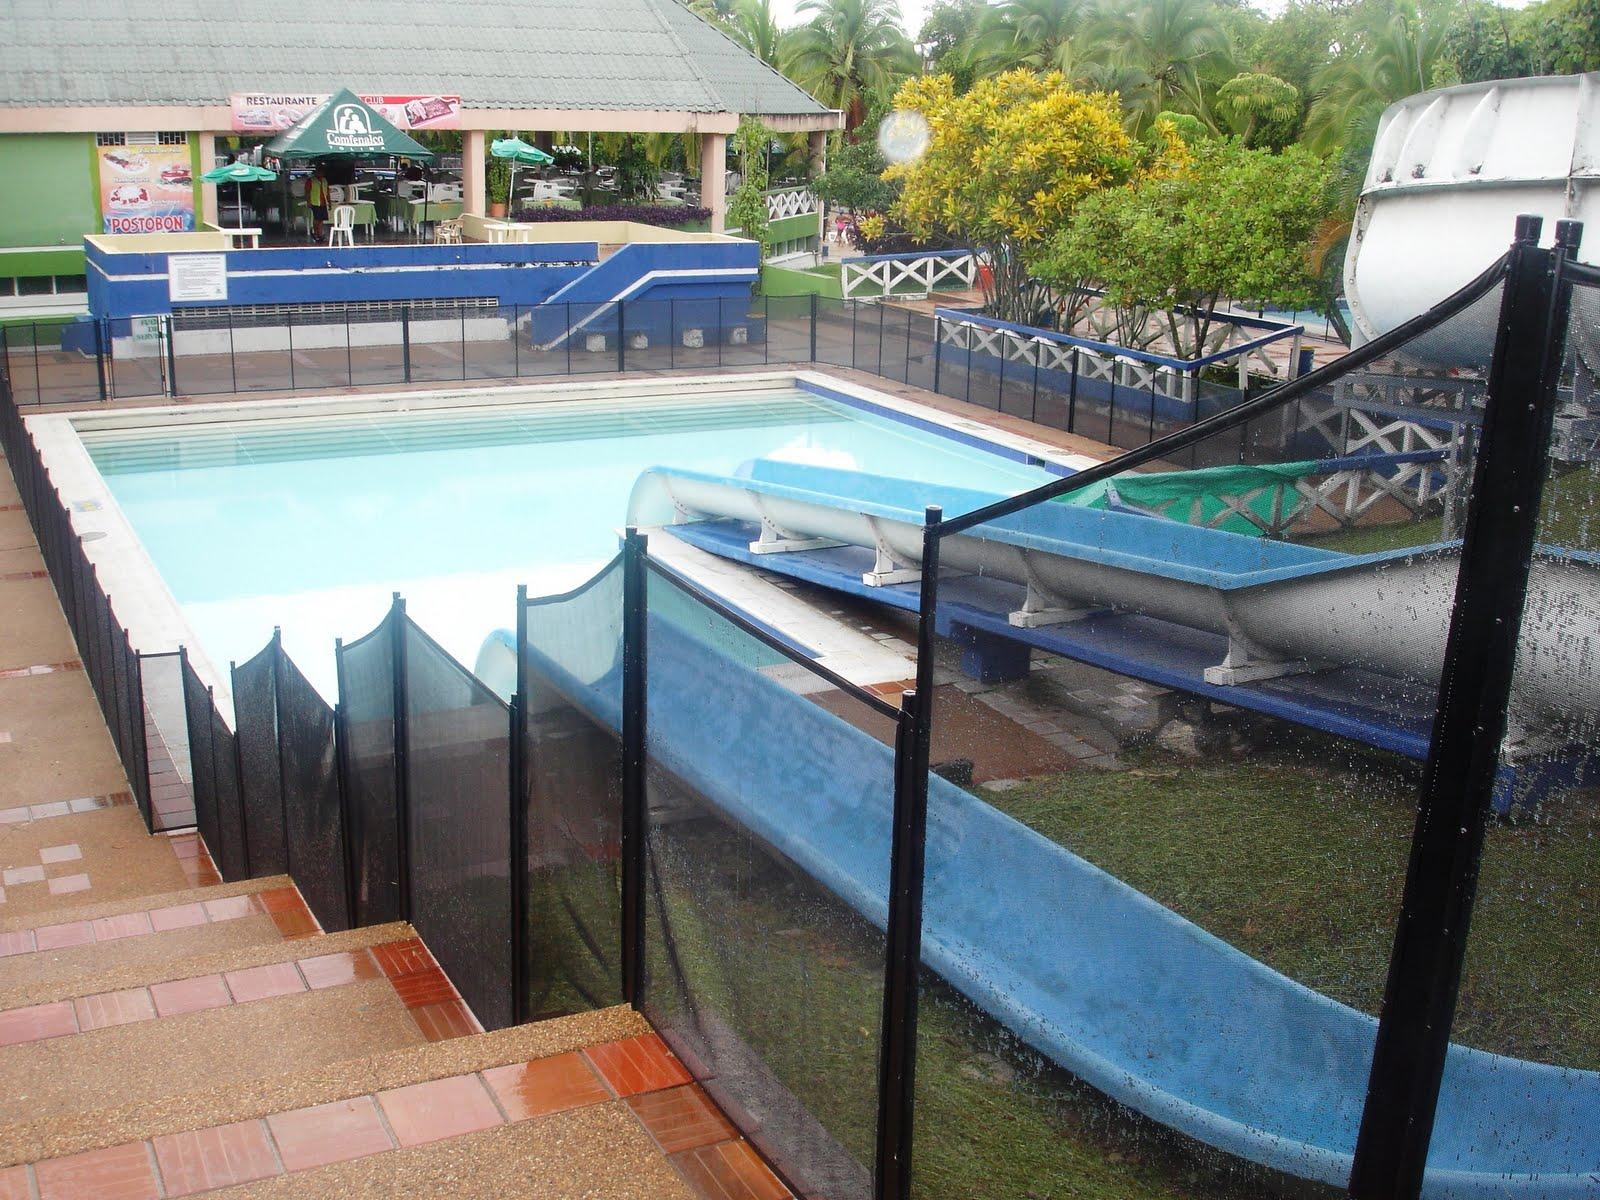 Cerramiento para piscinas cerramiento centro recreacional - Cerramiento para piscinas ...